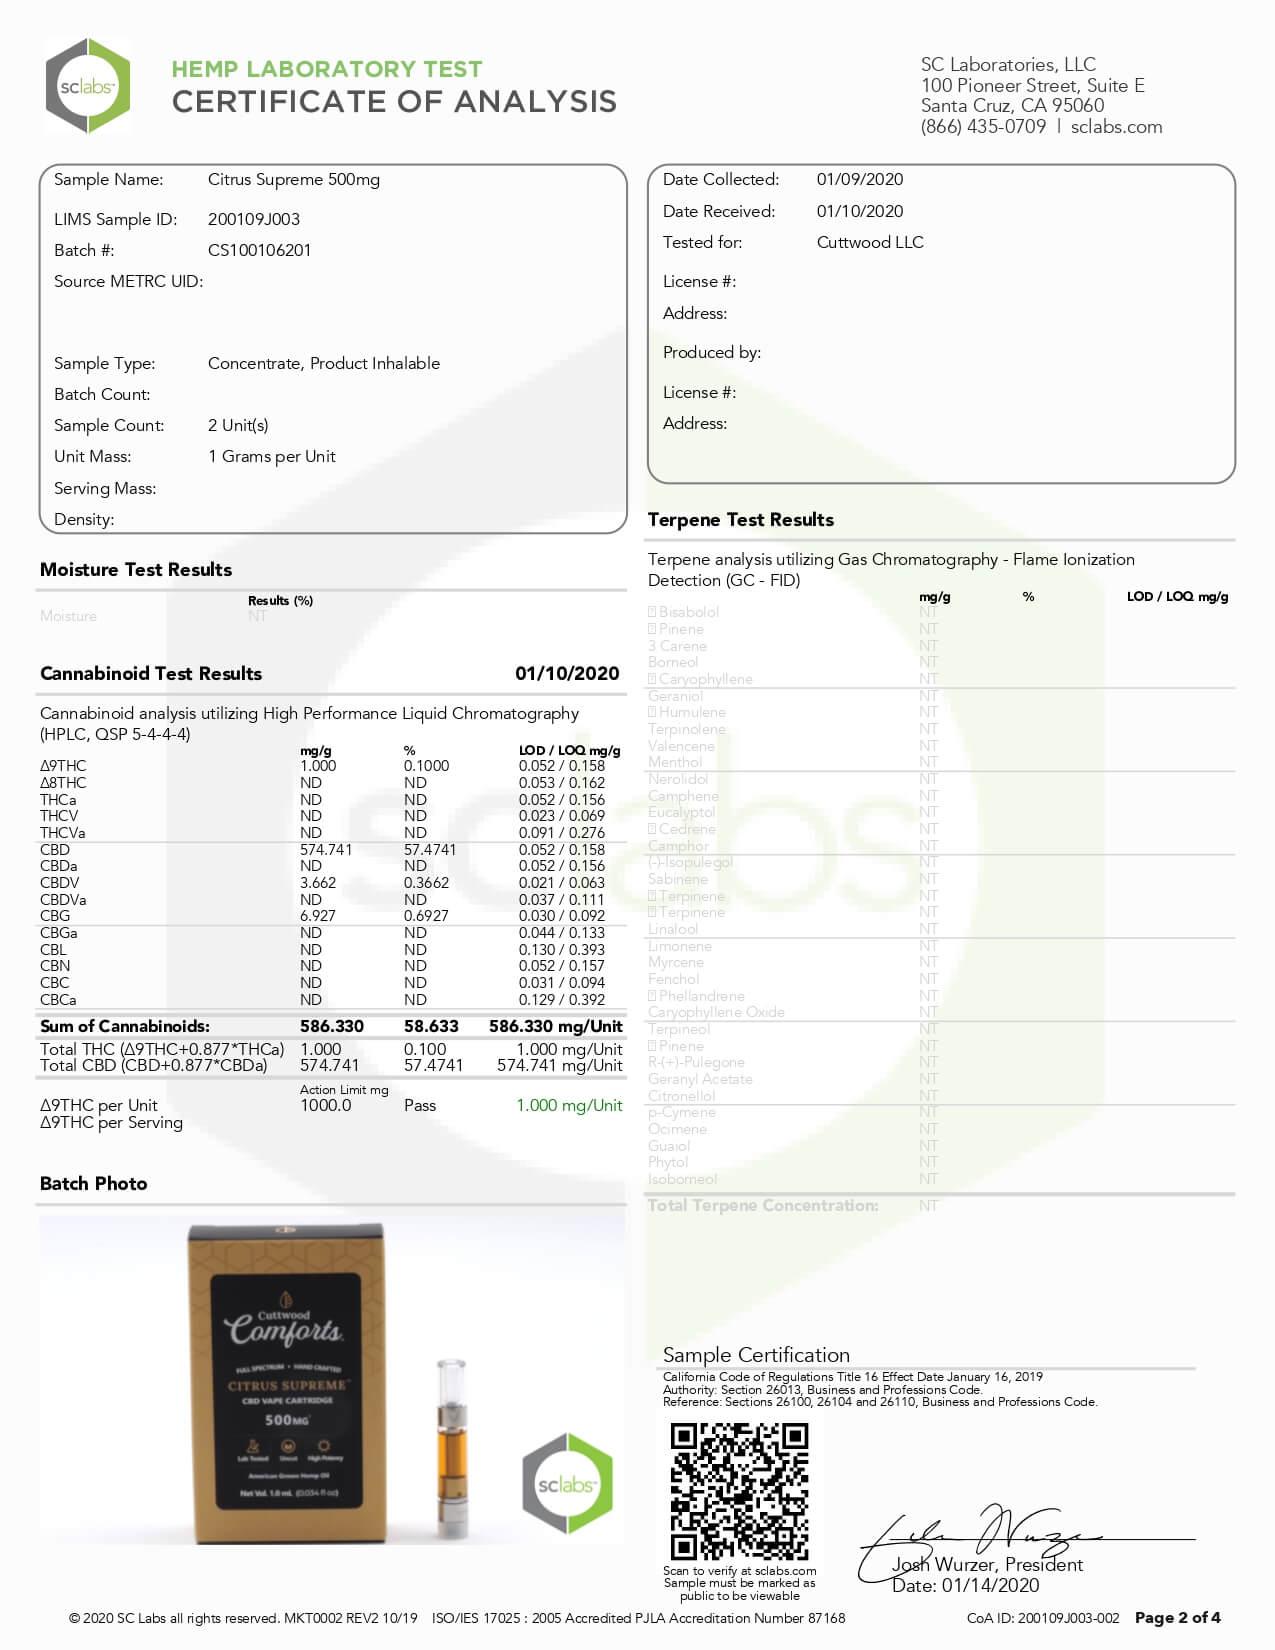 Cuttwood Comforts CBD Vape Cartridge Full Spectrum Citrus Supreme 500mg Lab Report